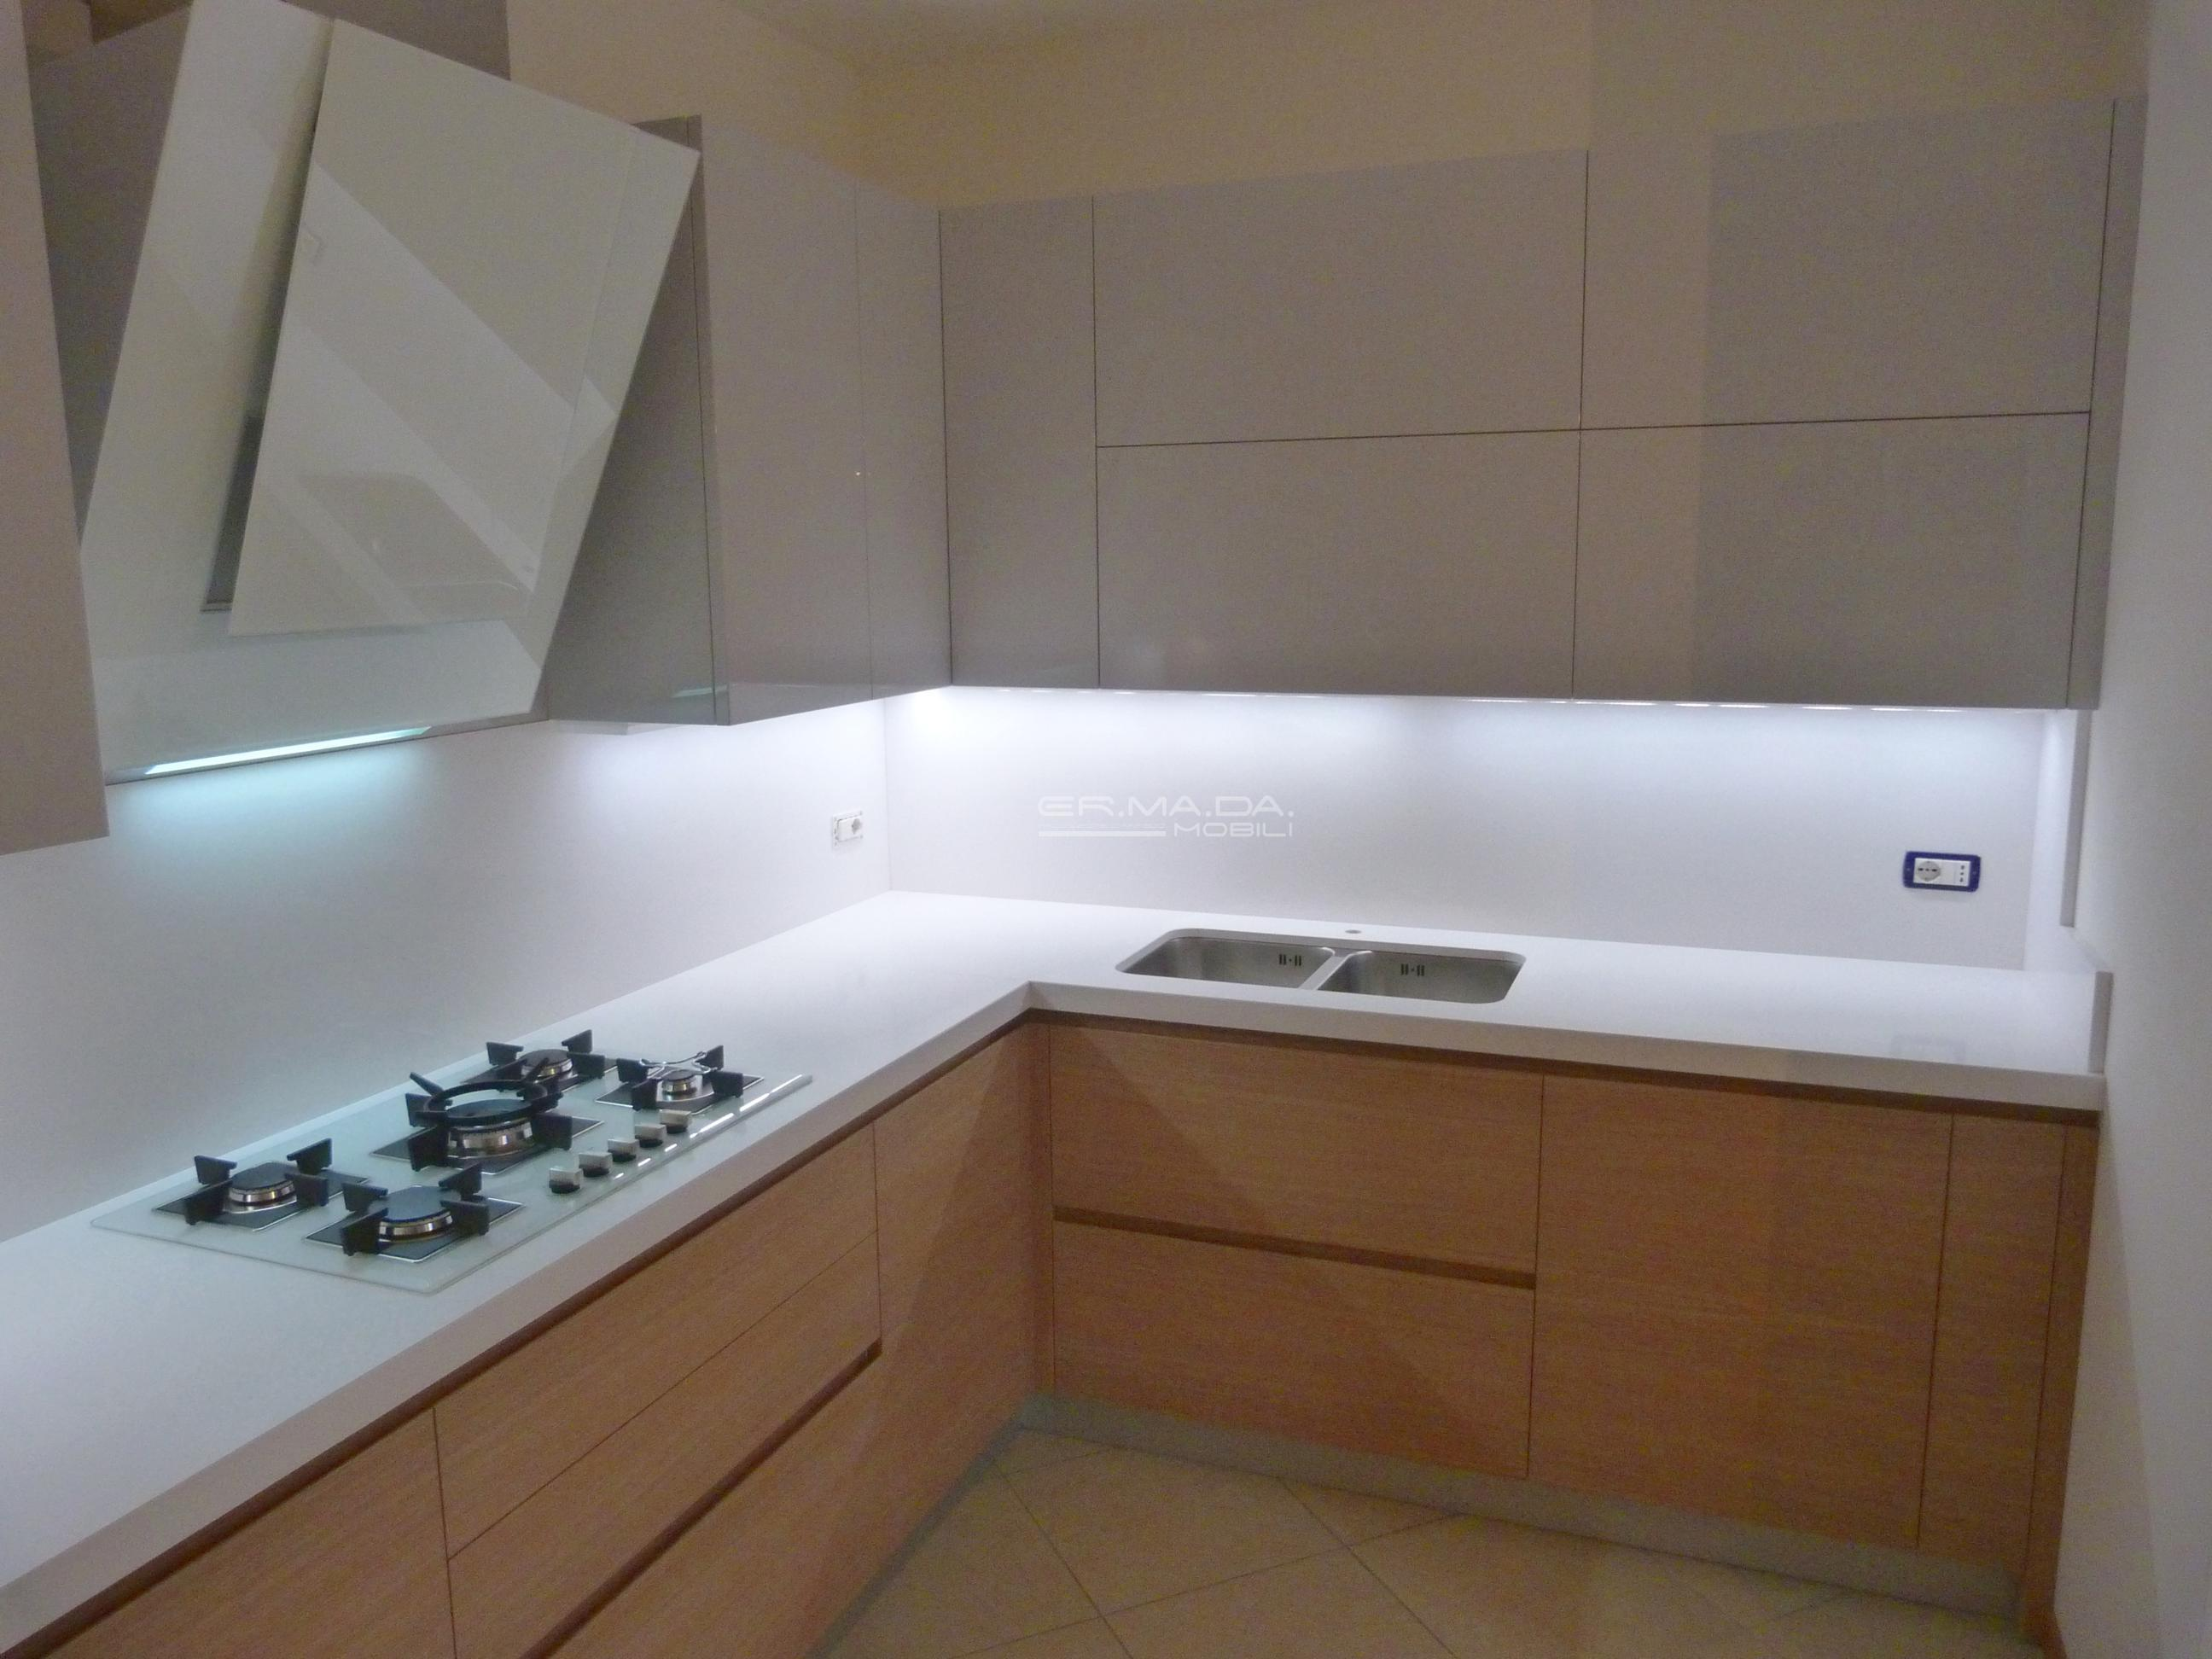 1 cucina moderna rovere e grigio lucido er ma da - Cucine moderne bicolore ...